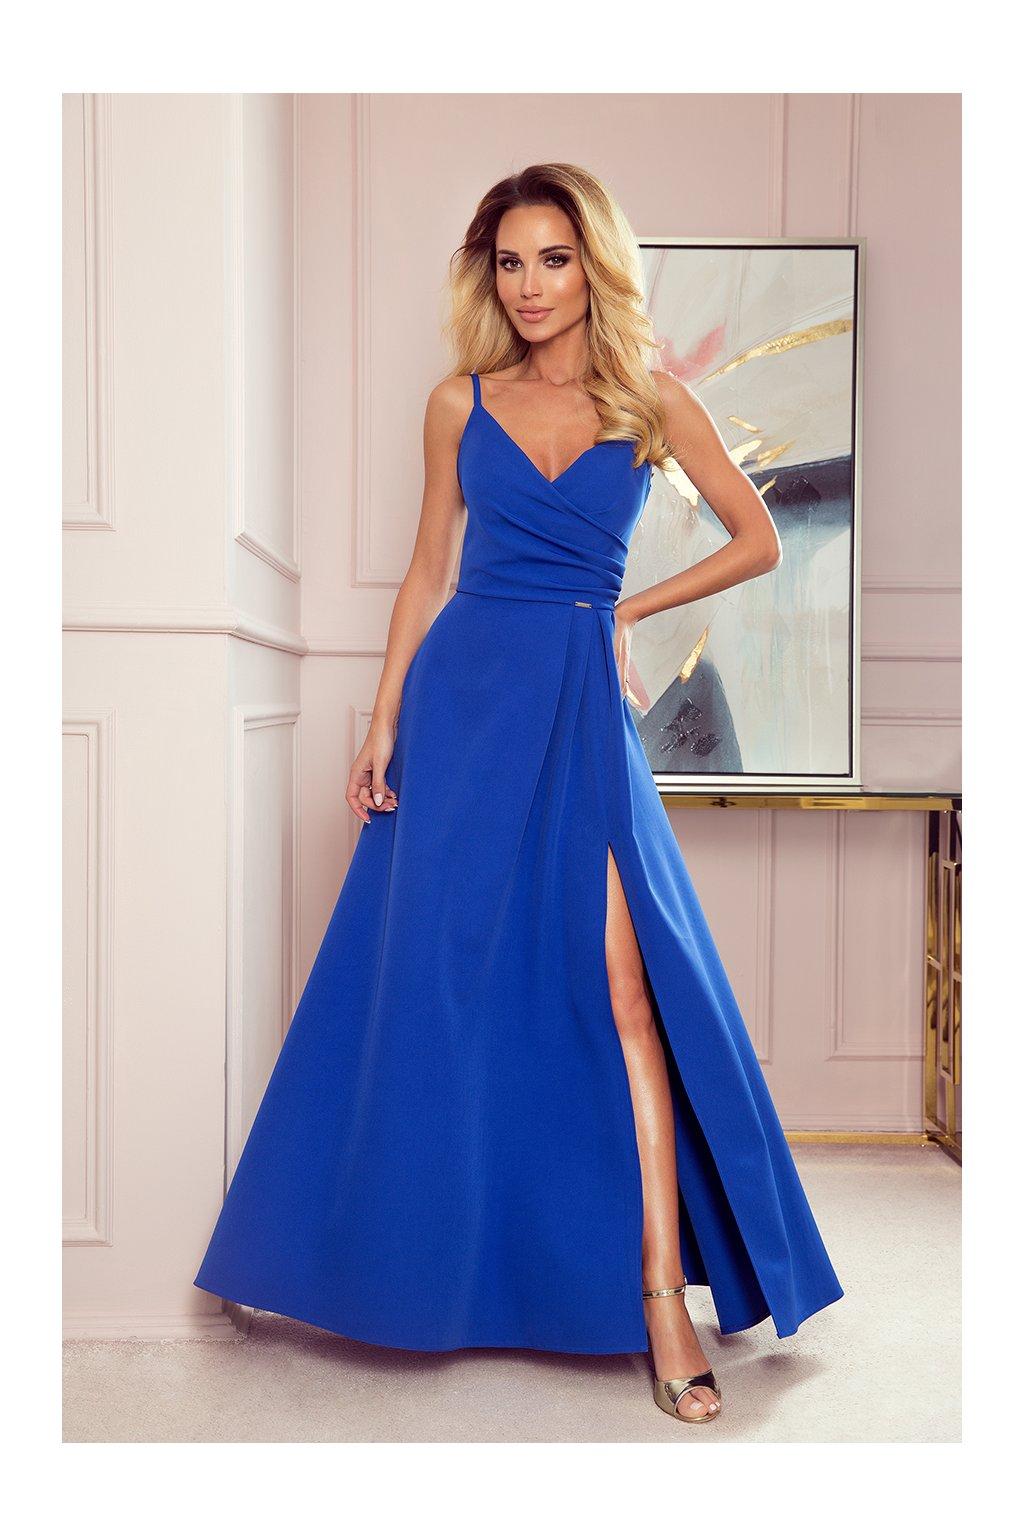 kralovsky modre 299 3 chiara elegancka maxi s 10807